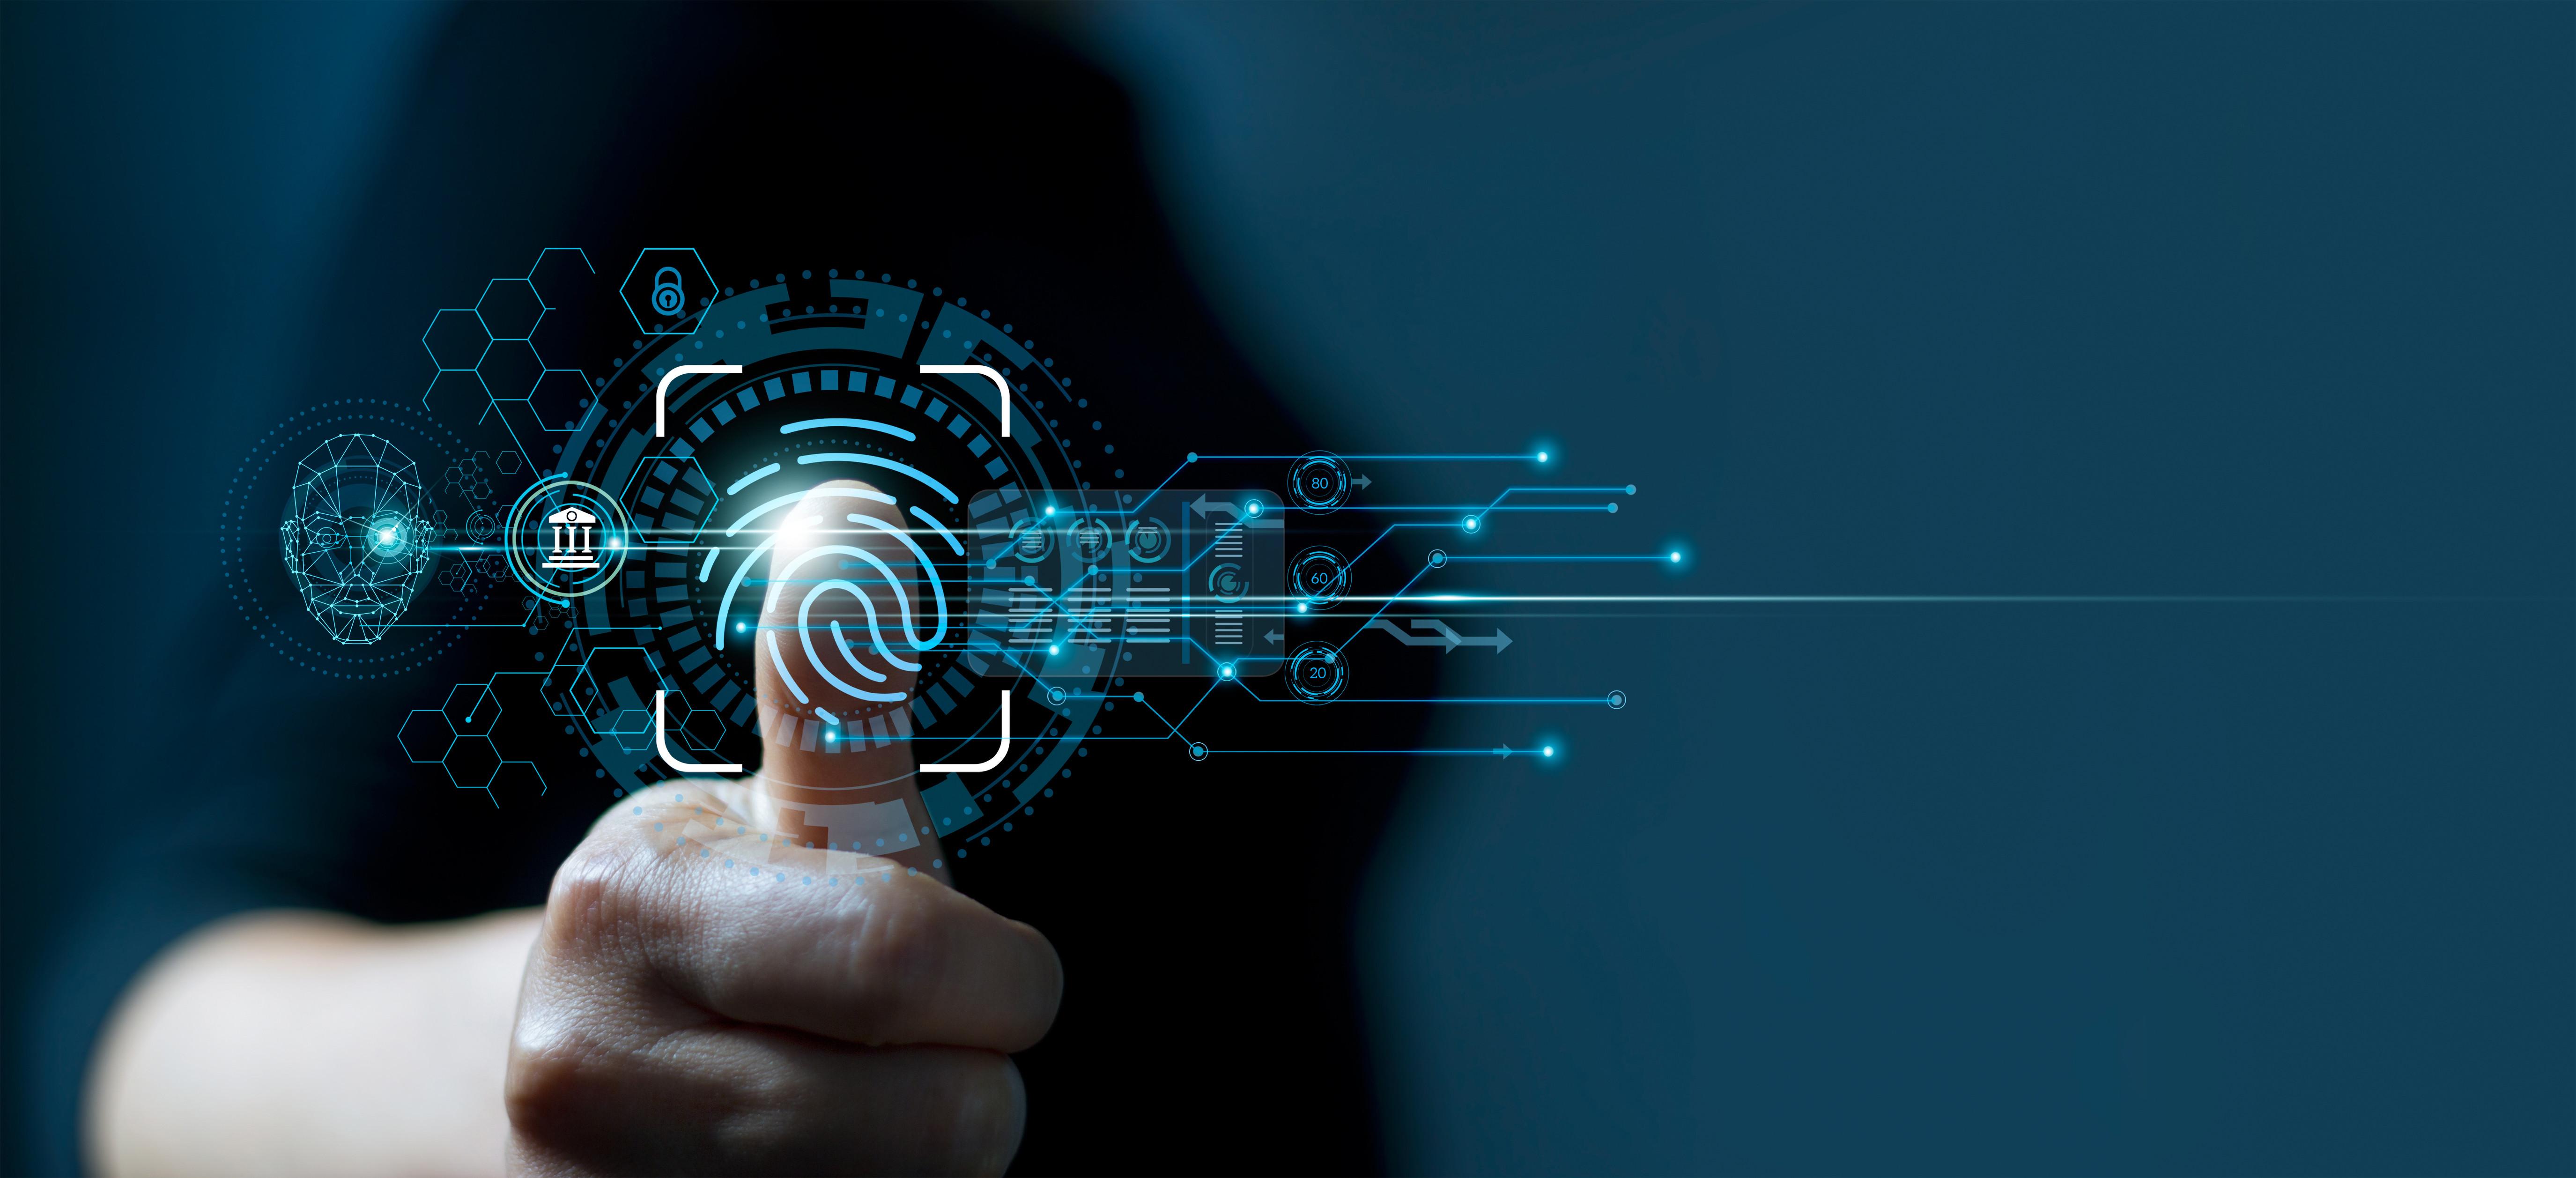 Fingerprint & NYS Application Assistance